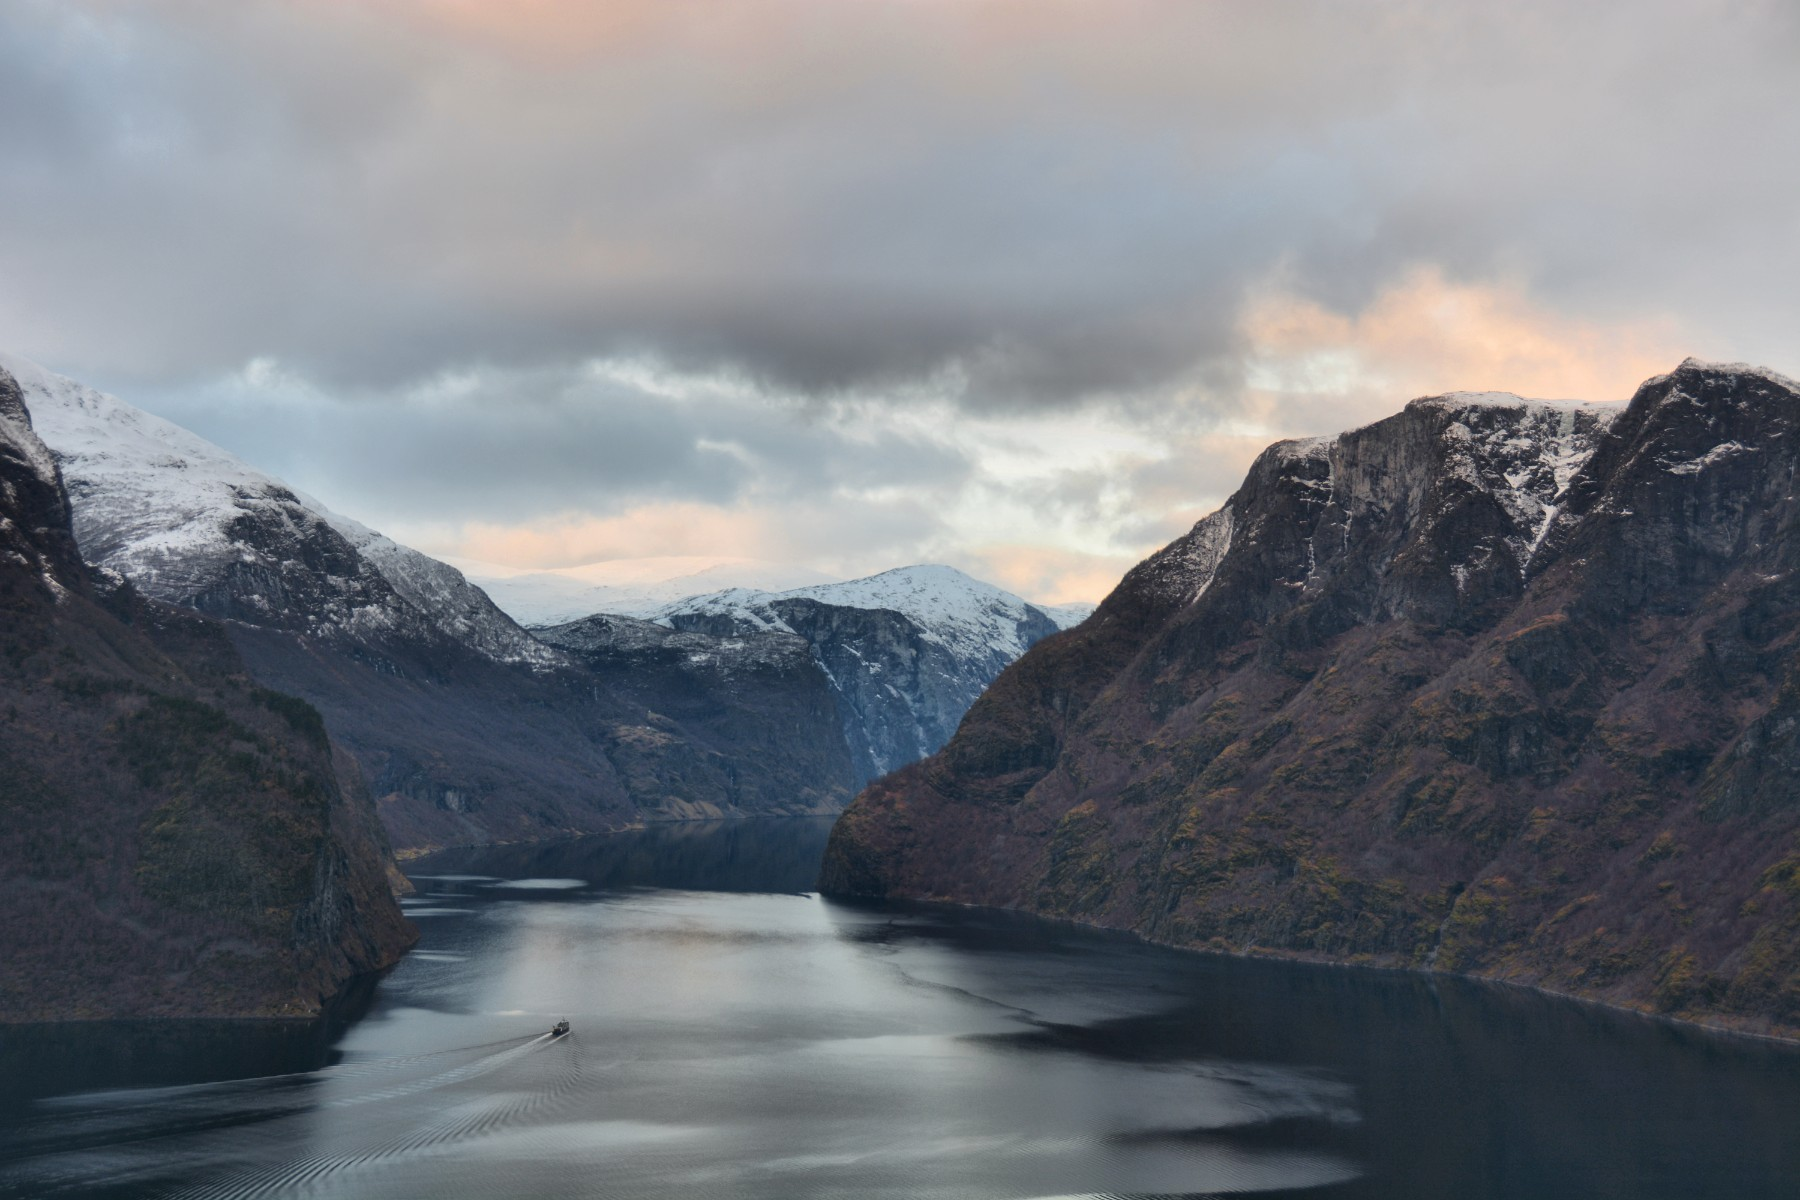 Ferry dwarfed by mountains